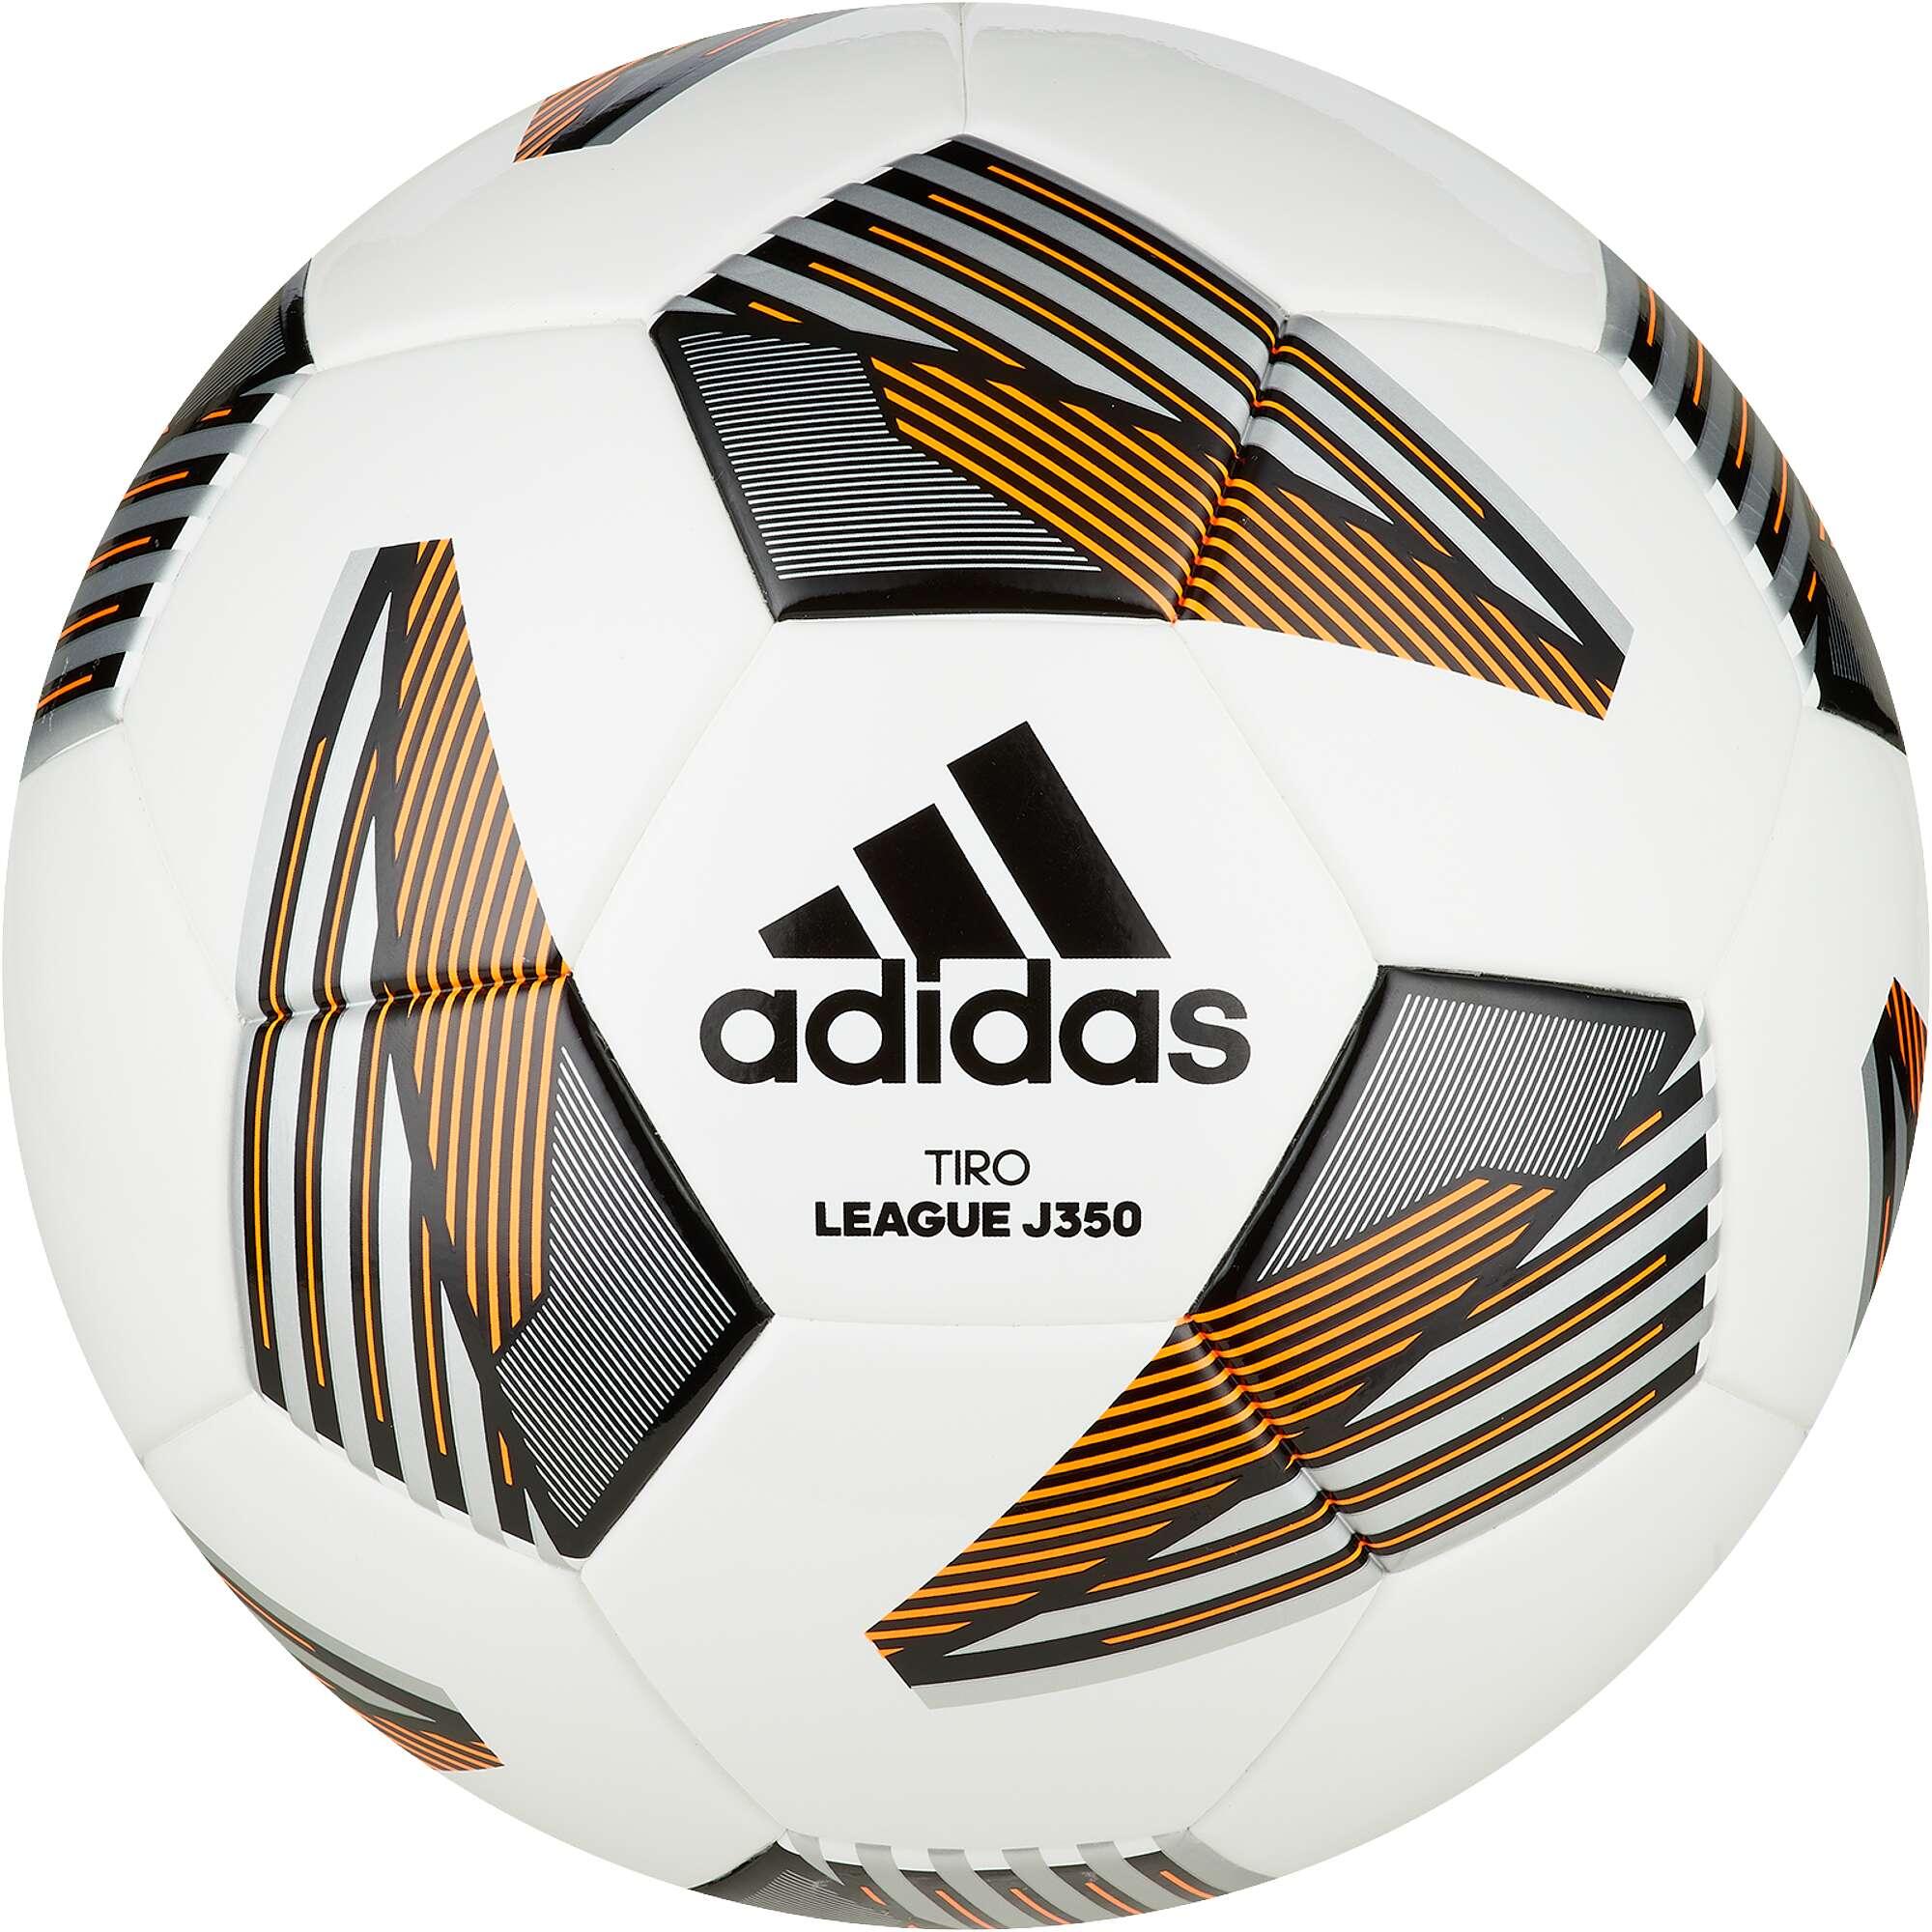 "Adidas Fußball ""Tiro League Junior"", Größe 5, 350 g"